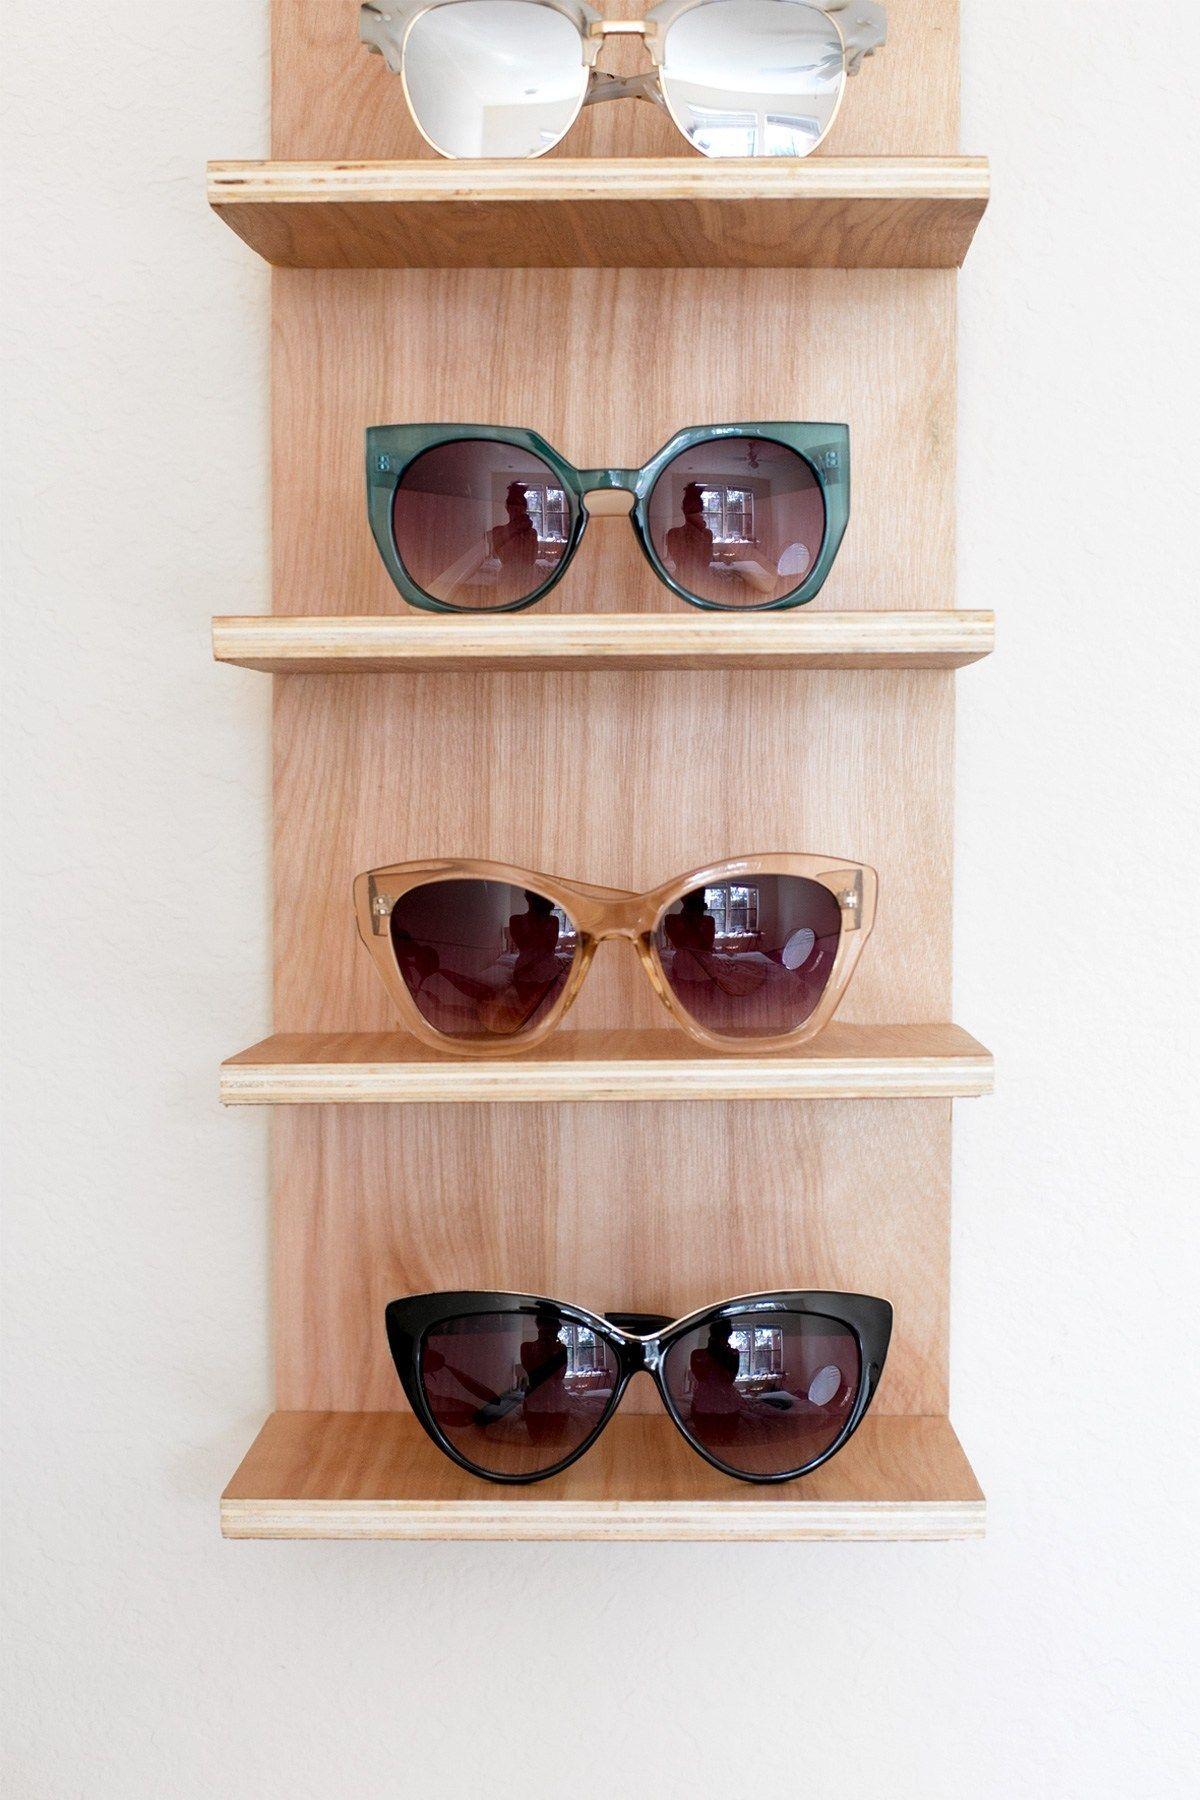 Renter Friendly Diy Sunglasses Holder For End Of Summer Storage Ctrl Curate Diy Sunglasses Holder Sunglass Holder Diy Sunglasses